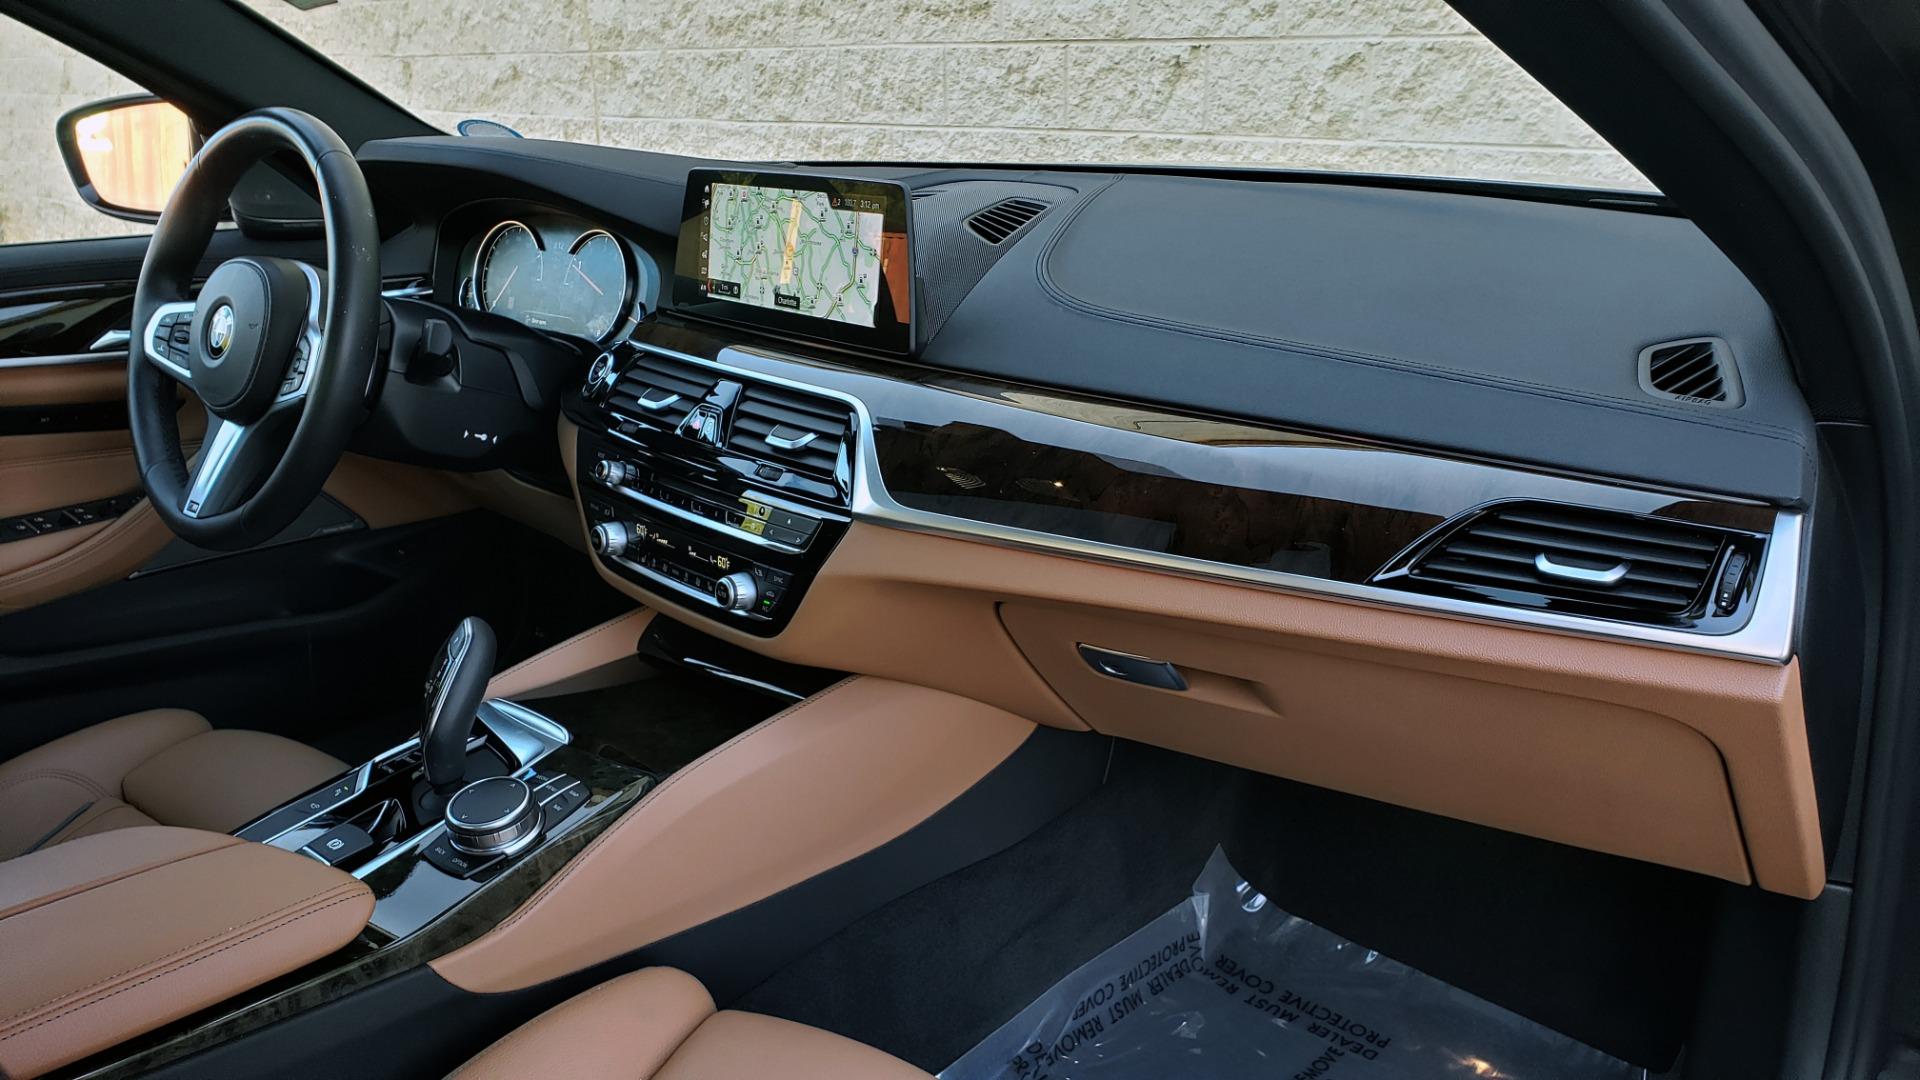 Used 2018 BMW 5 SERIES 540I M-SPORT / DRVR ASST / EXEC PKG / NAV / SUNROOF / HUD / REARVIEW for sale Sold at Formula Imports in Charlotte NC 28227 68